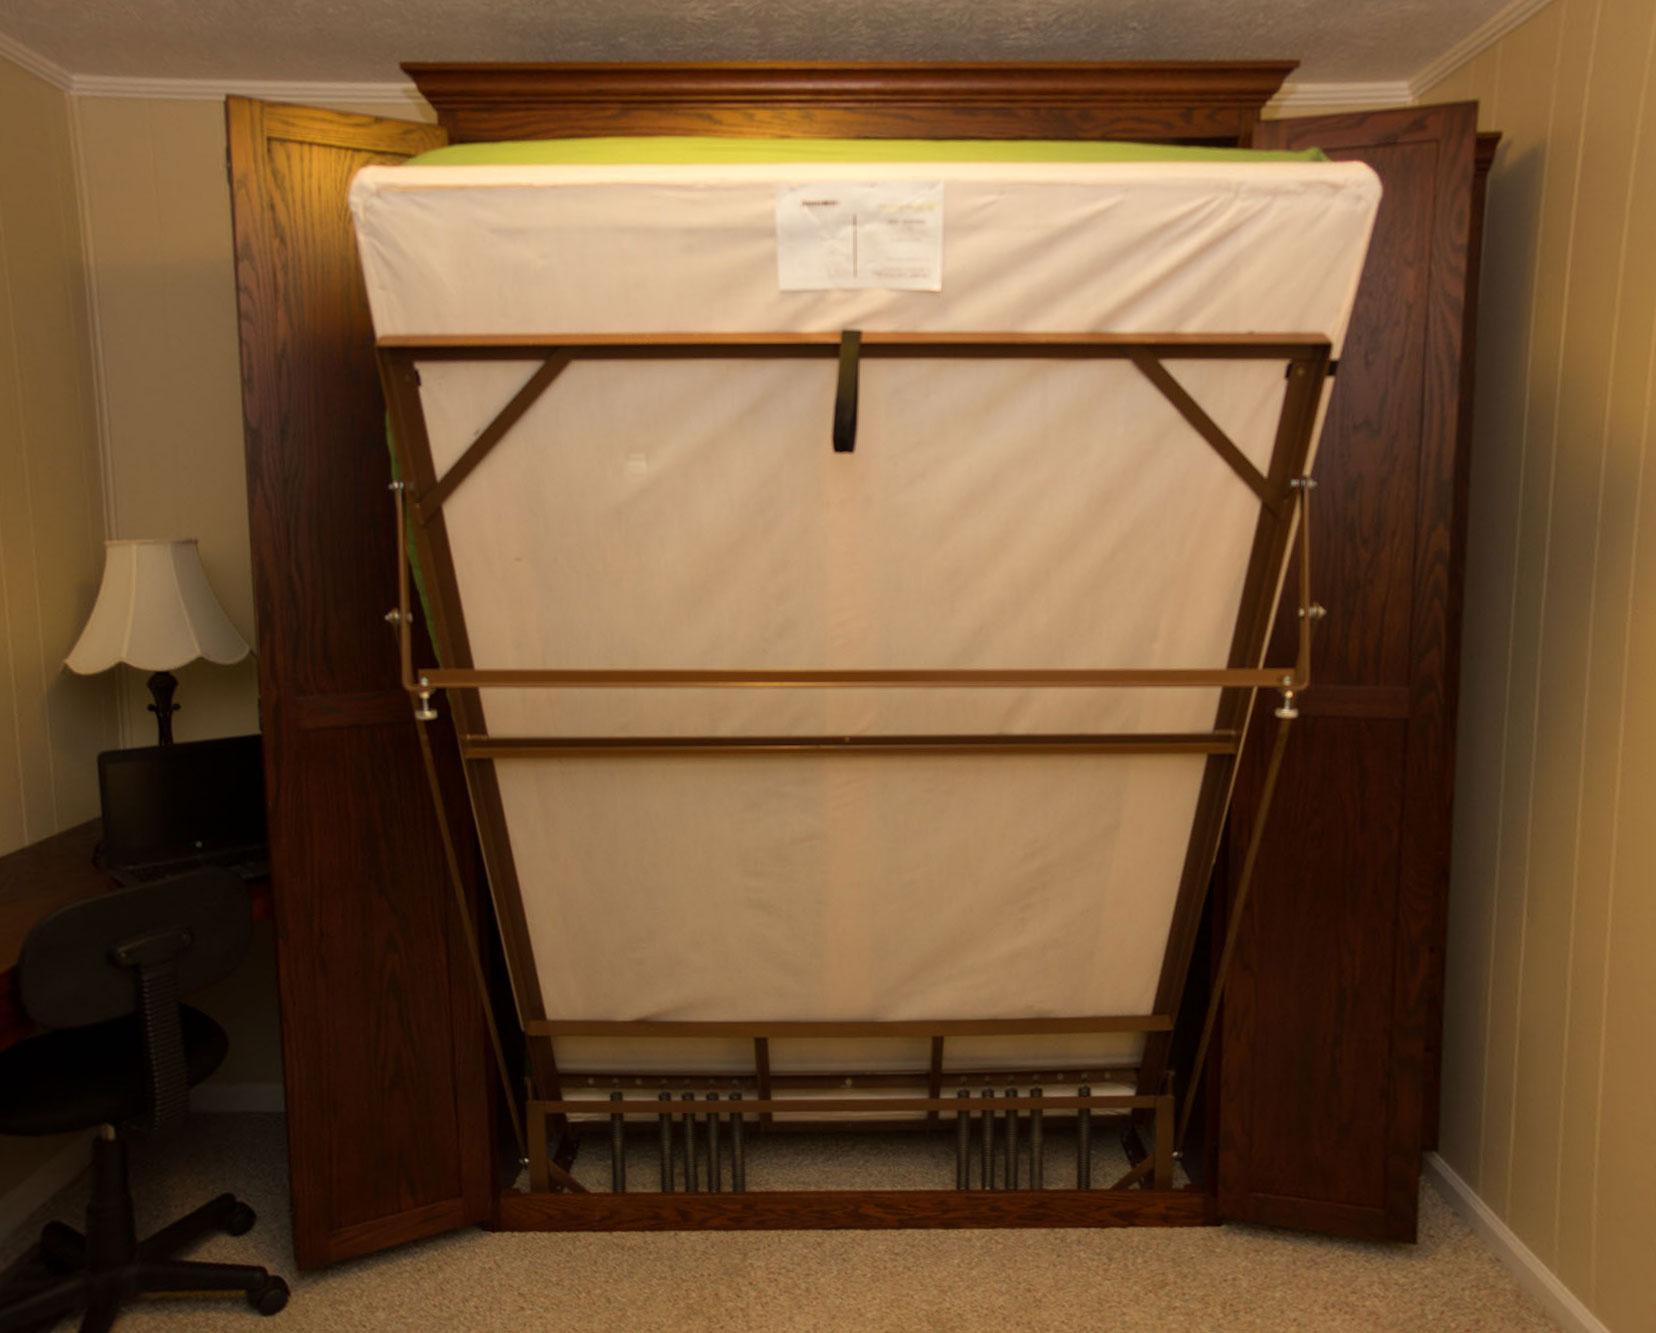 ezrest murphy bed frame in action - Ez Bed